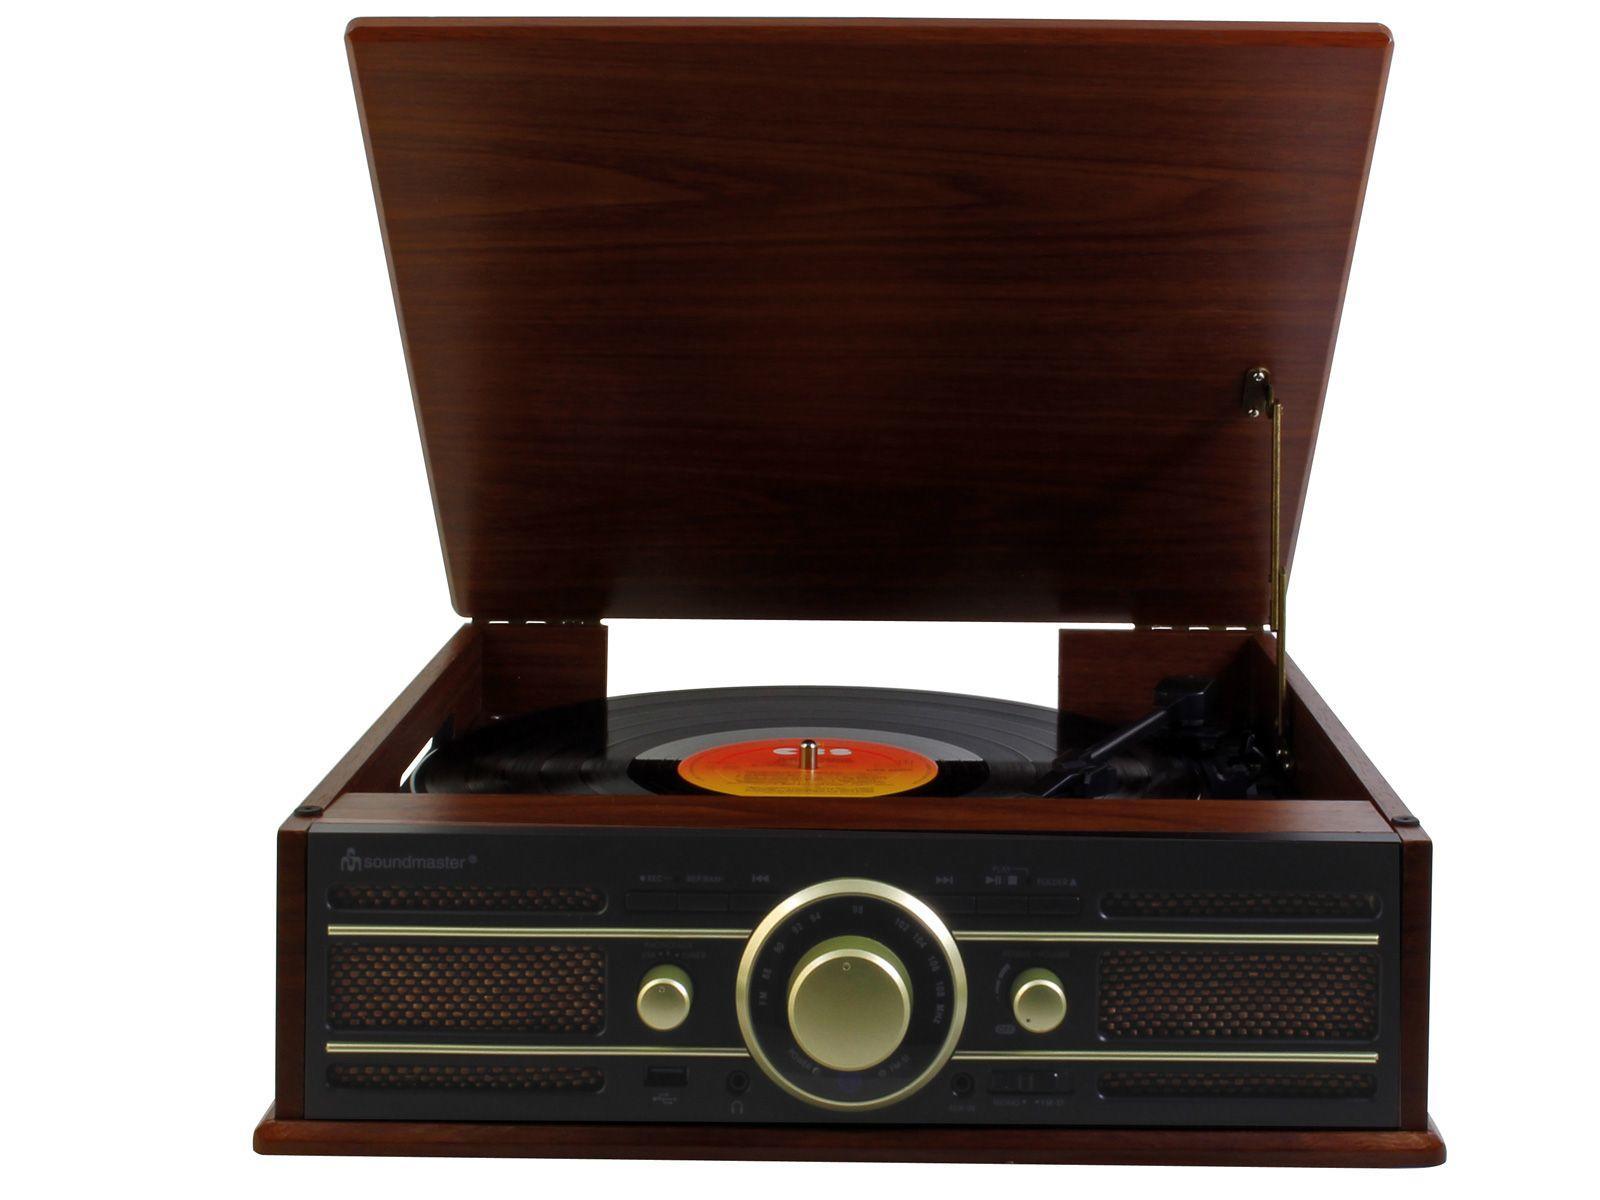 Soundmaster Pl550br Retro Vinyl Record Player Amp Fm Radio